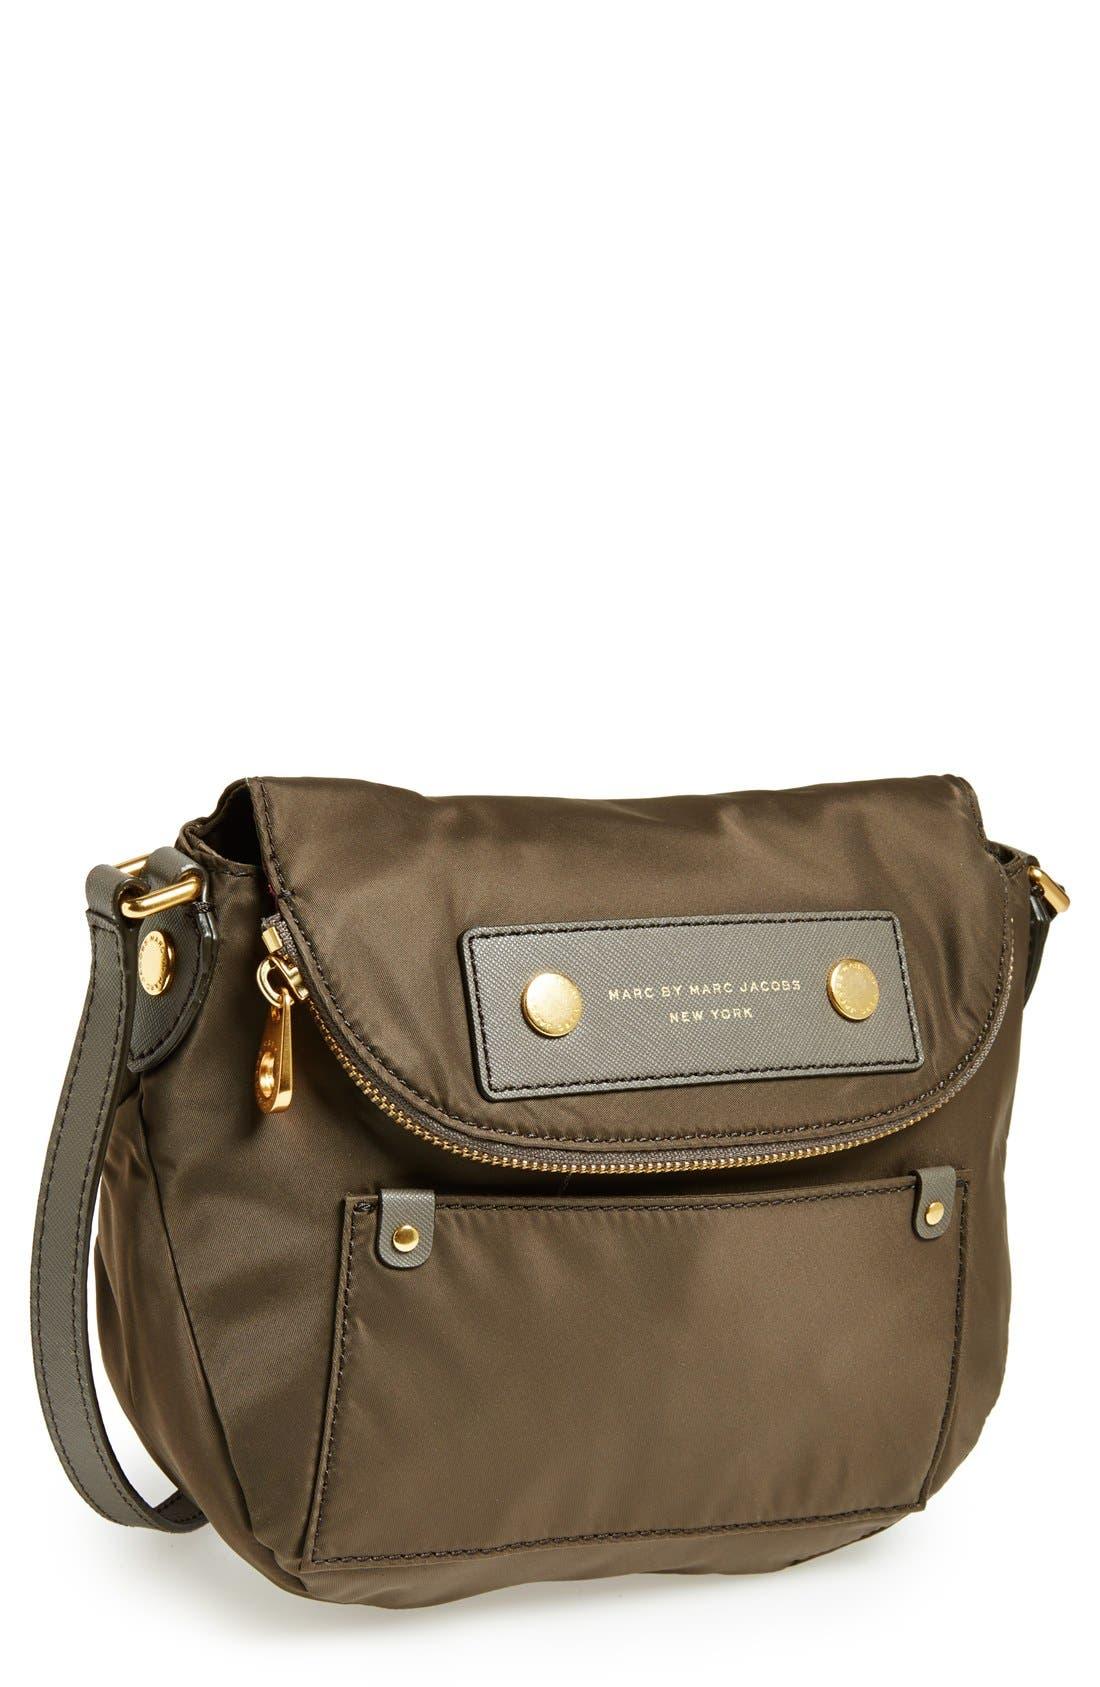 Alternate Image 1 Selected - MARC BY MARC JACOBS 'Mini Preppy Nylon Natasha' Crossbody Bag